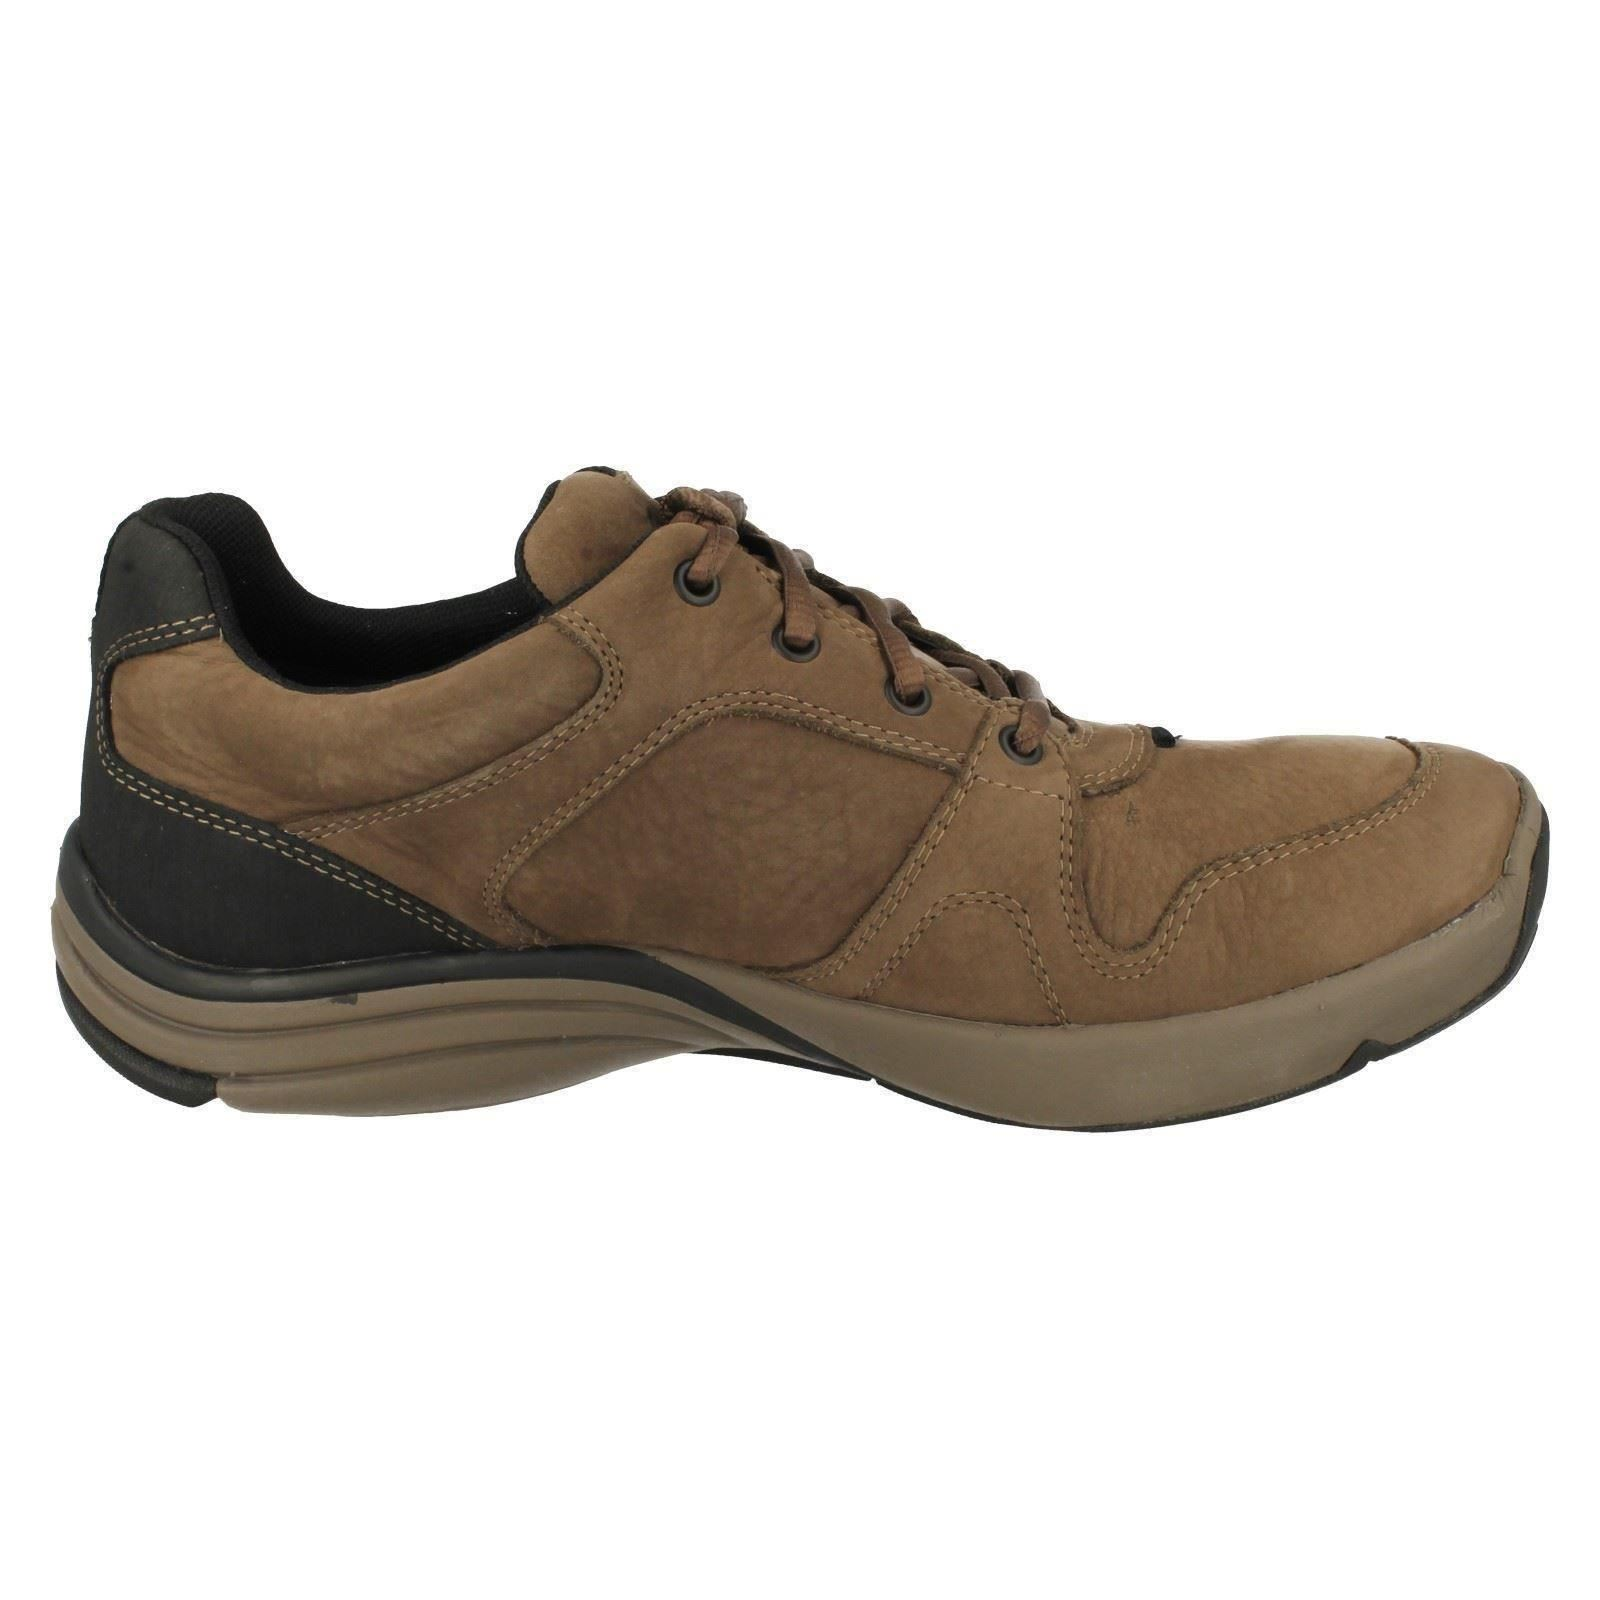 Clarks Wave Shoes Uk